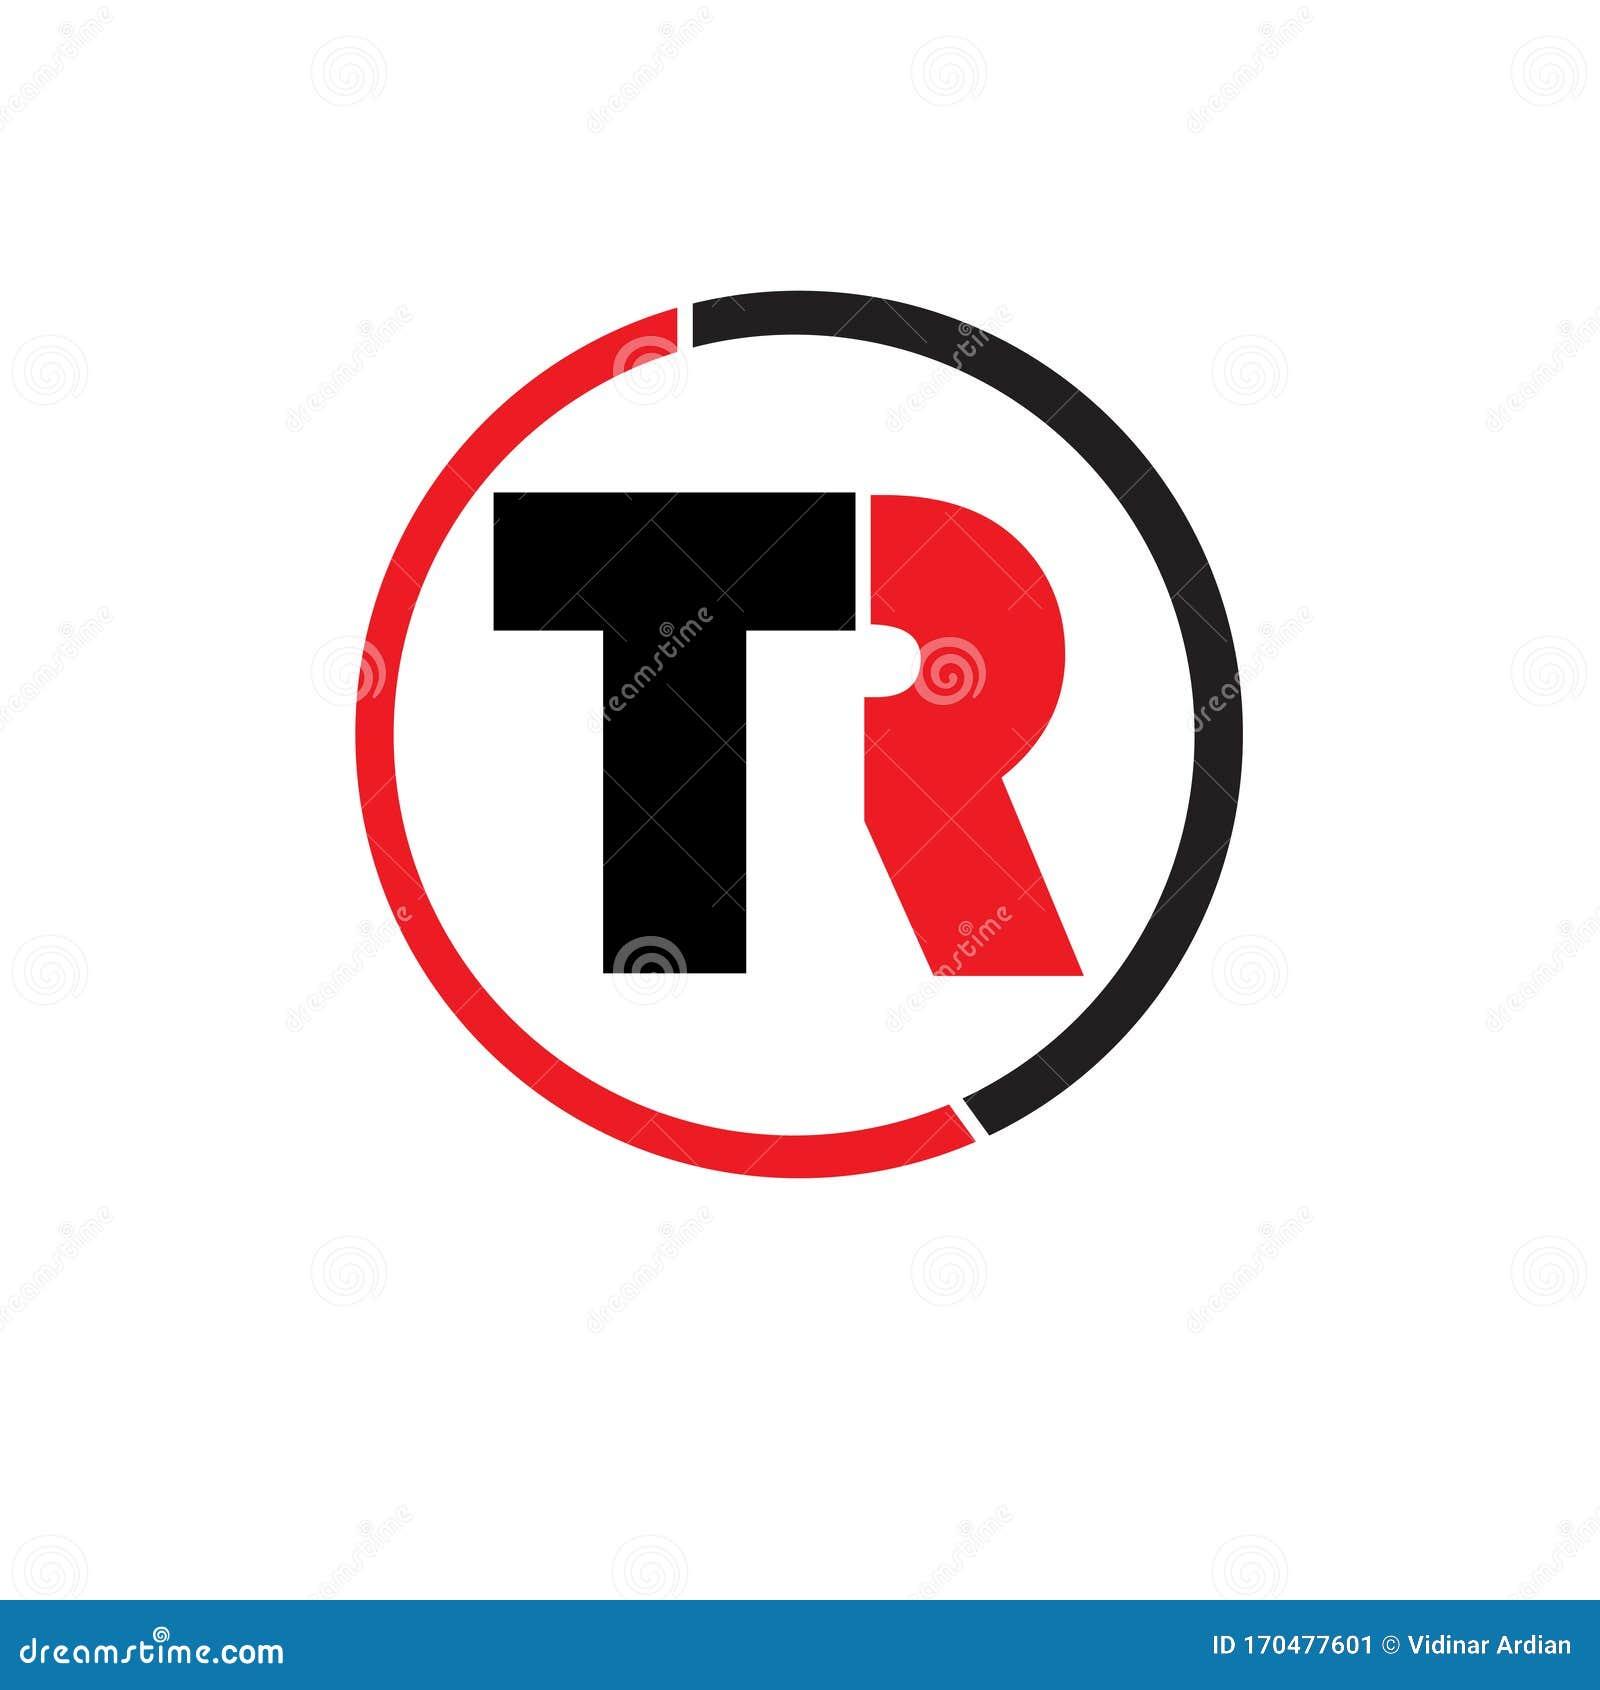 TR Letter Initial Icon Logo Design Inspiration Vector